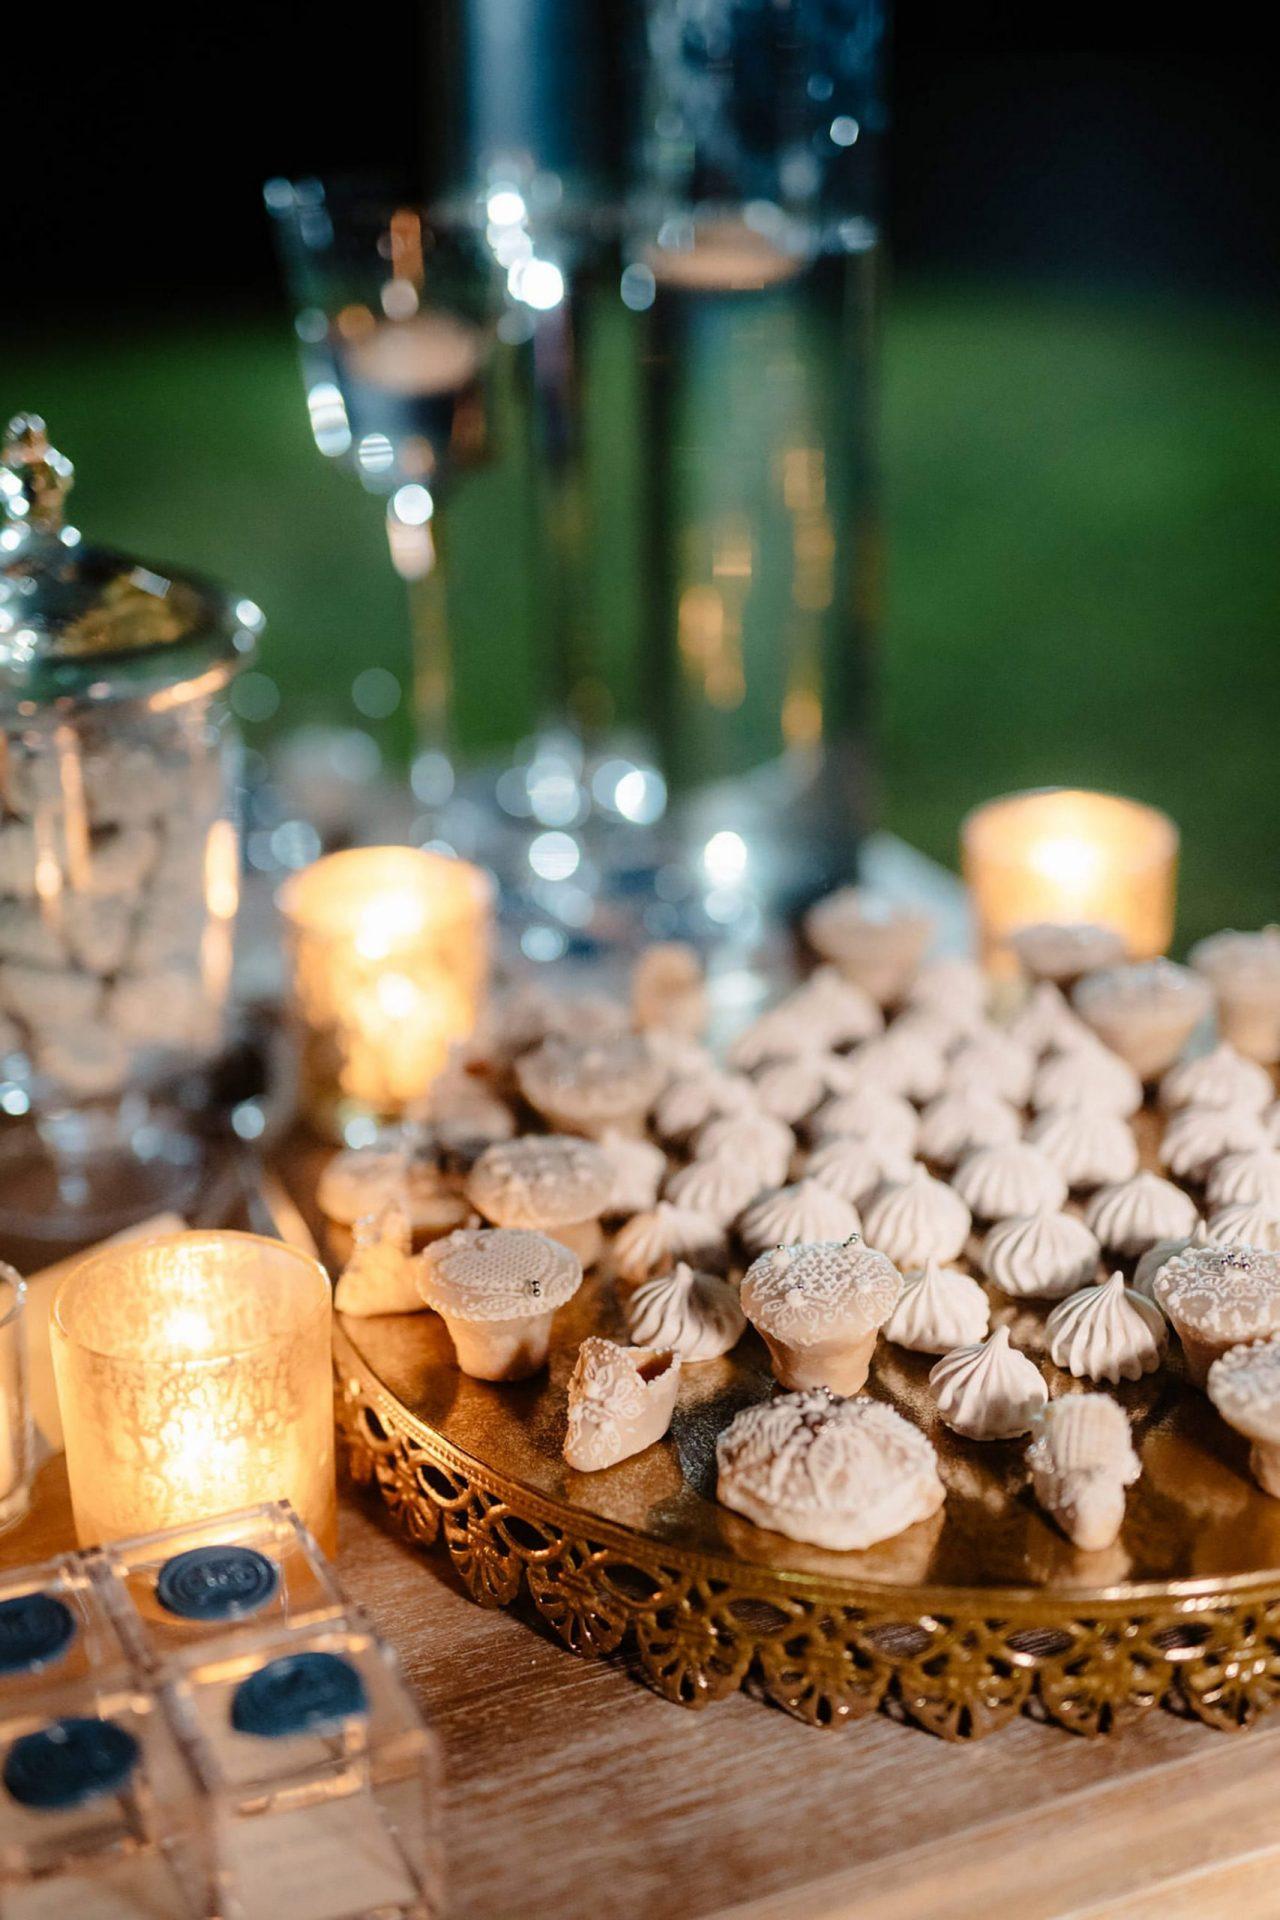 Linda and Enrico, Sardinian wedding sweets